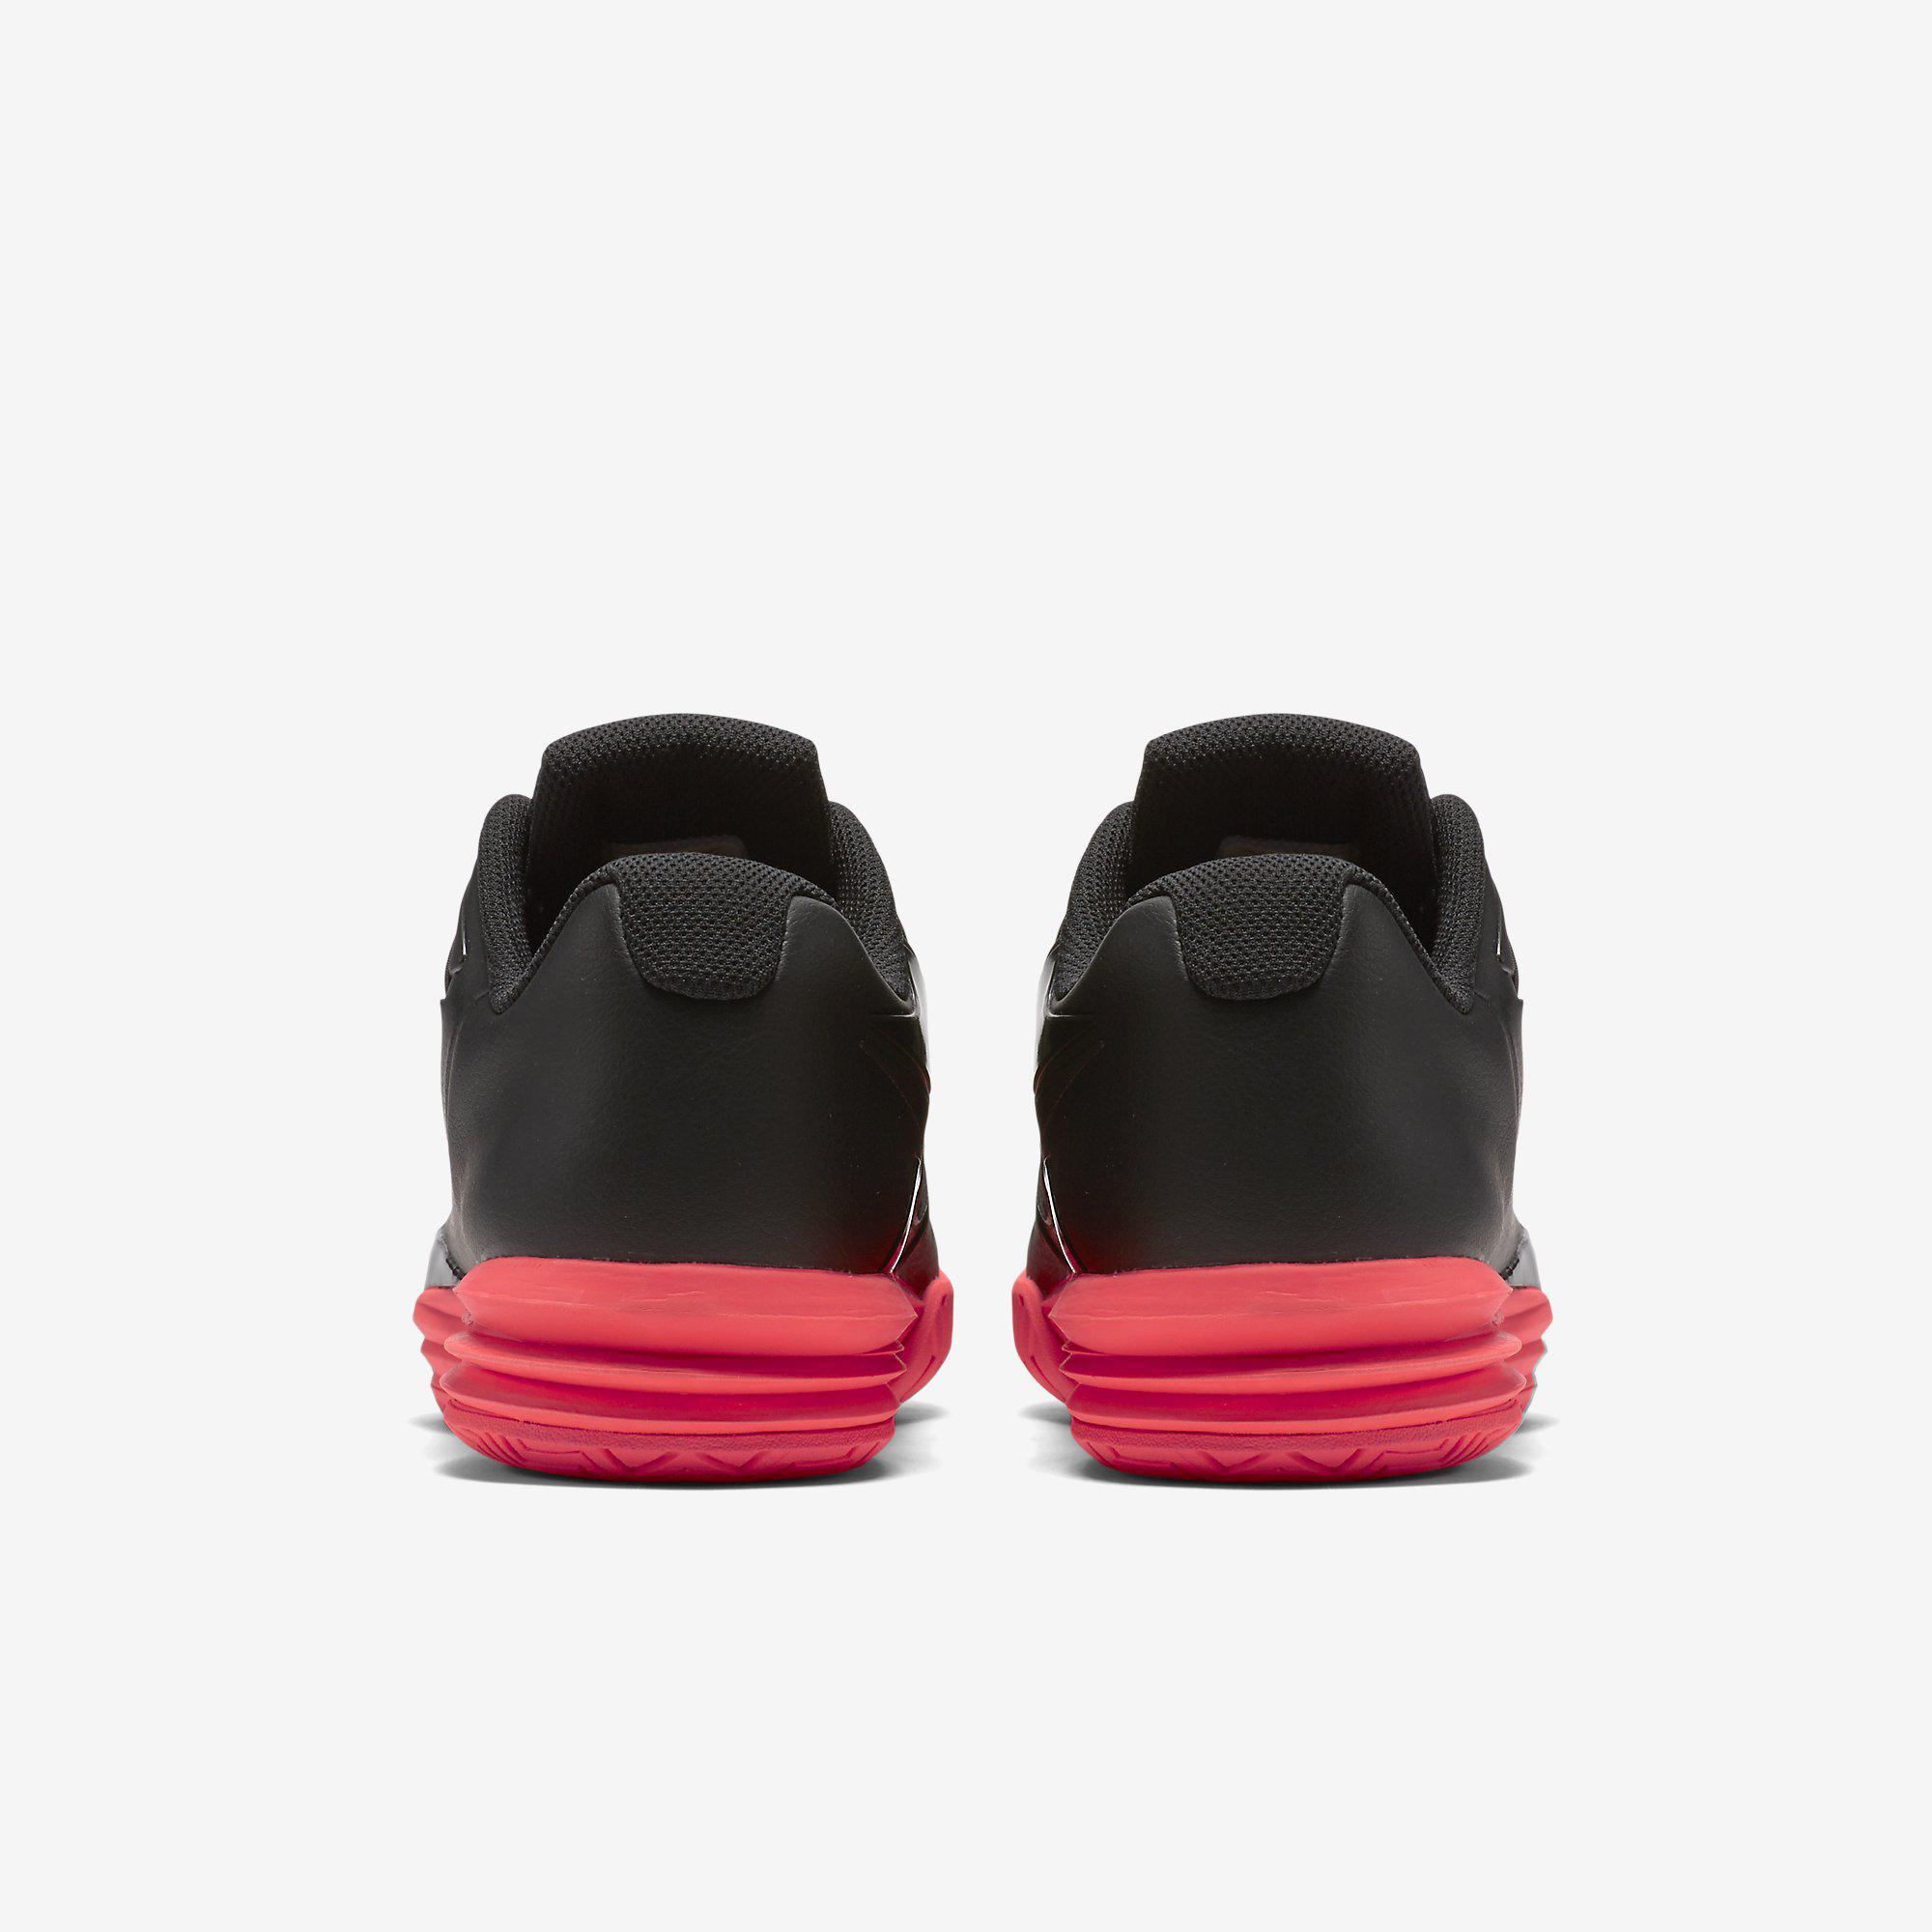 04ceb43ce184 Nike Mens Lunar Ballistec 1.5 Tennis ... 2017 Womens Blue Nike Shoes Mens Nike  Lunar Ballistec 1.5 Legend Black ...